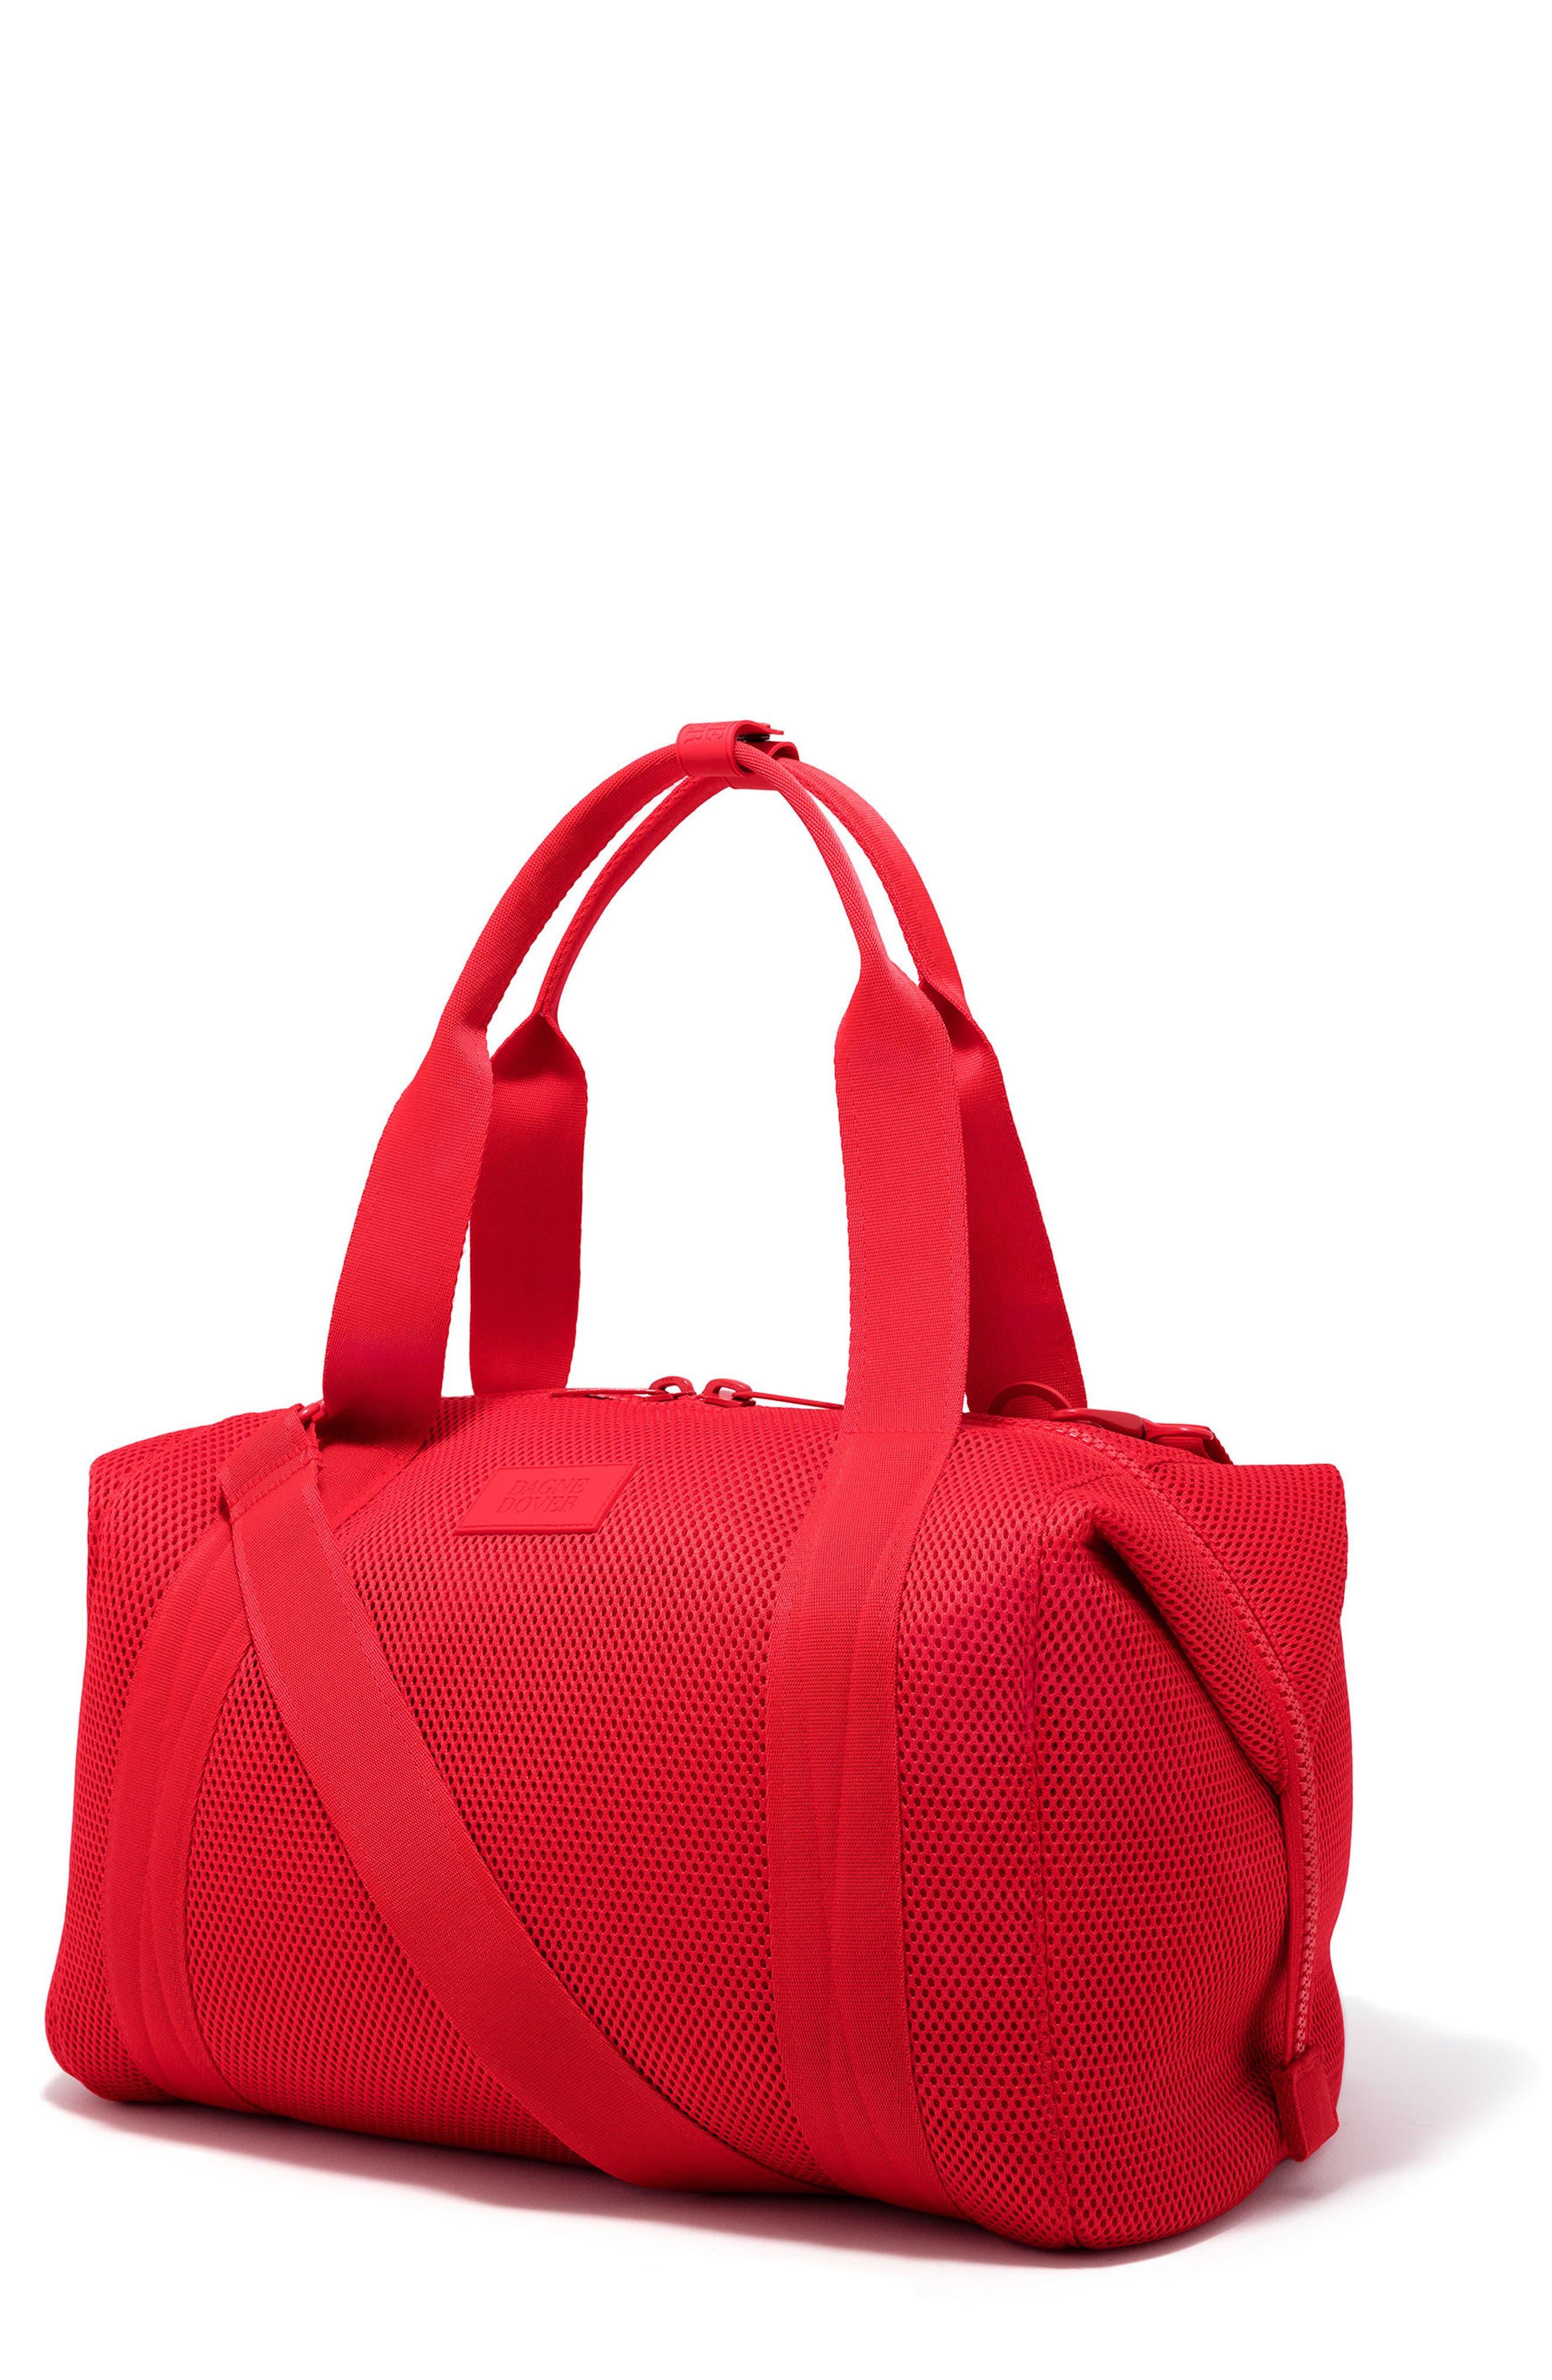 365 Large Landon Neoprene Carryall Duffel Bag,                             Main thumbnail 8, color,